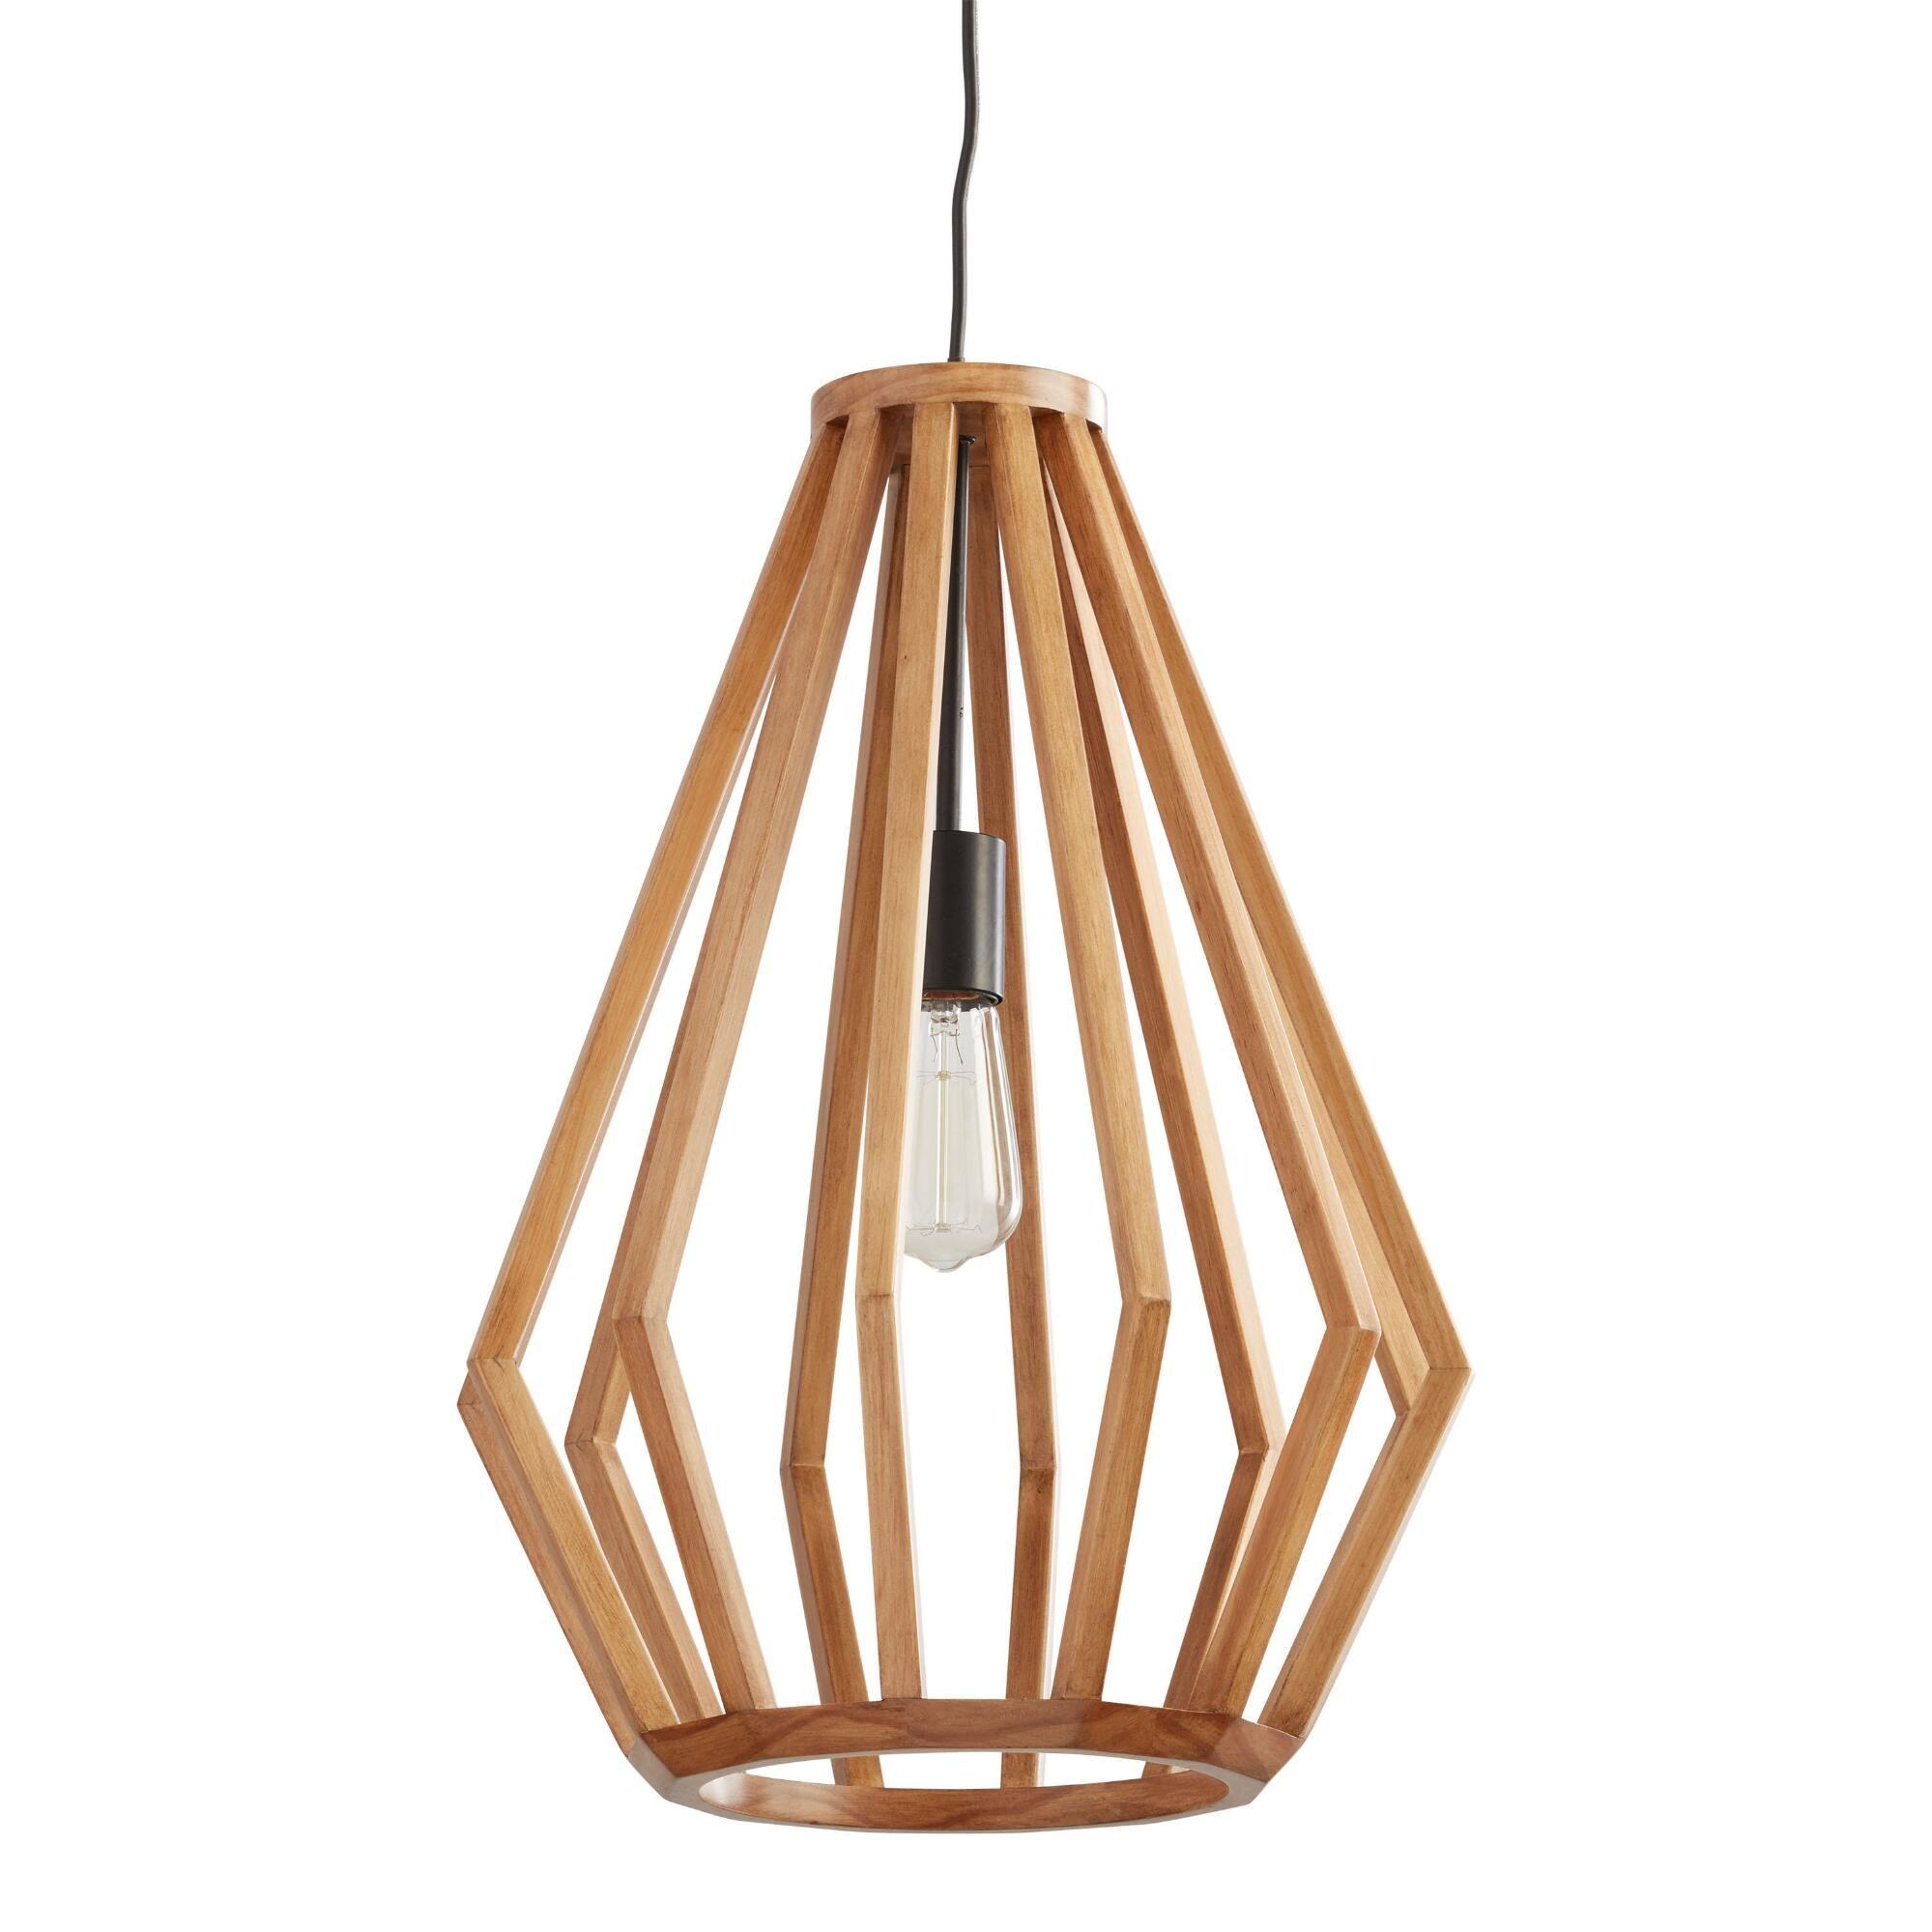 Wooden Pendant Light In 2020 Wooden Pendant Lighting Pendant Lamp Wood Pendant Lamps